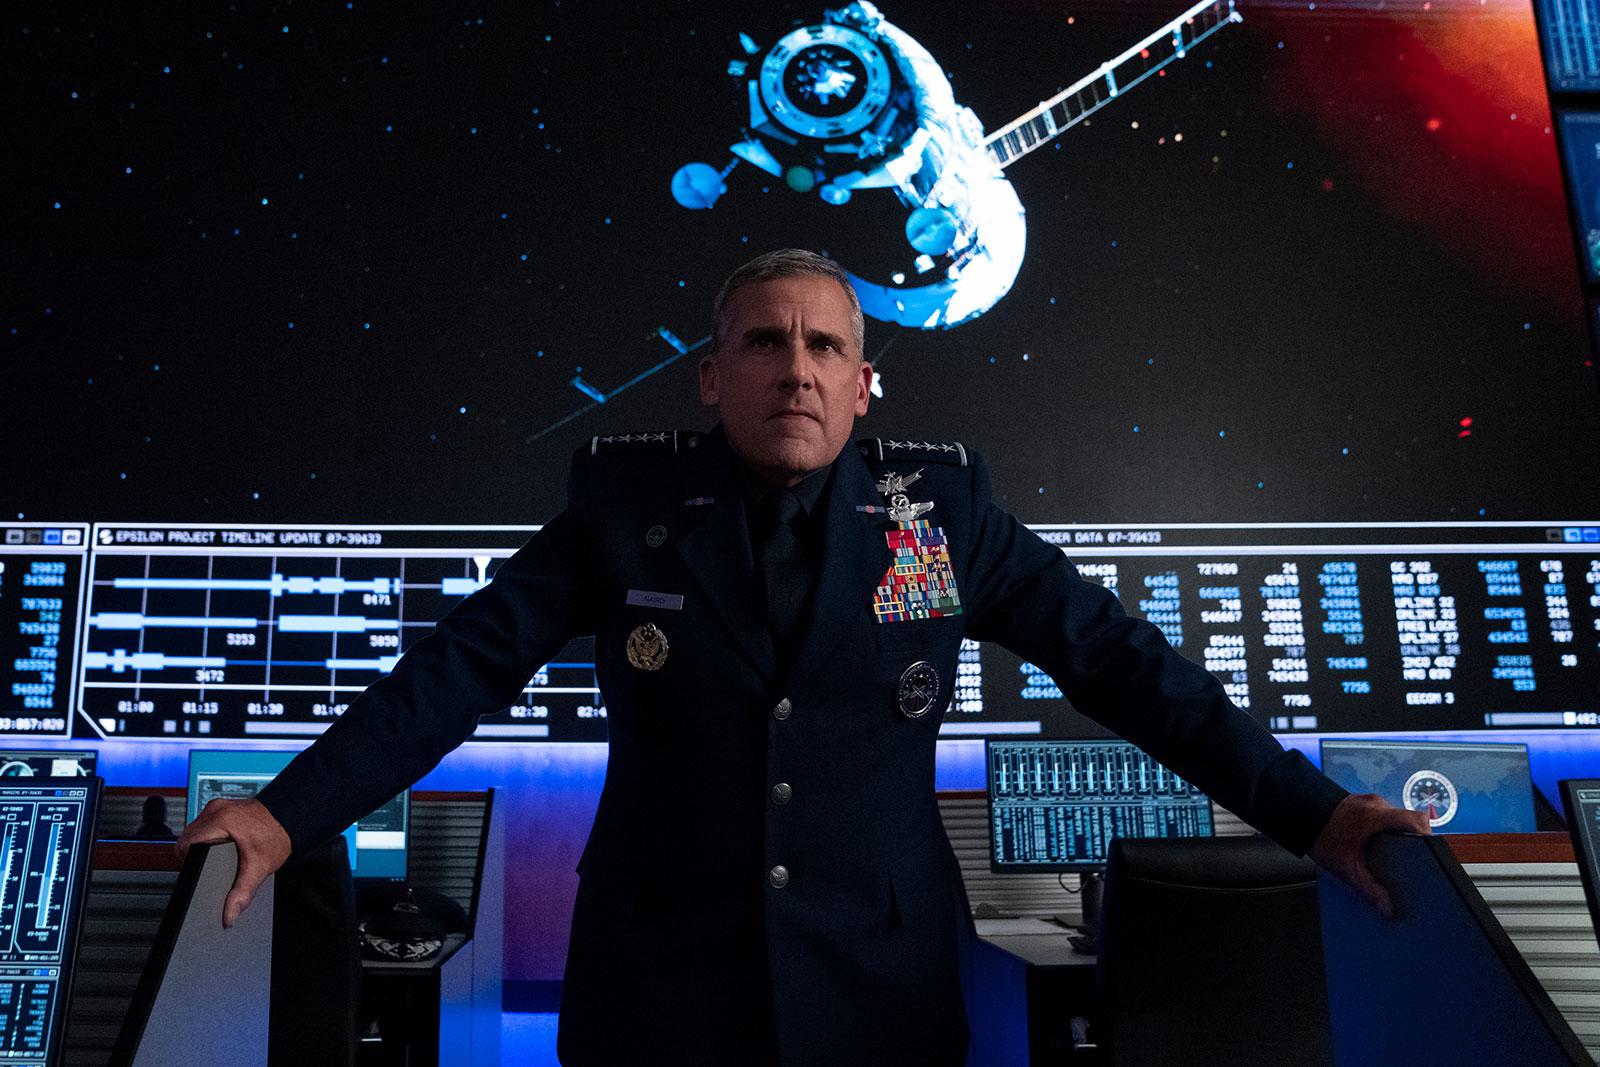 Netflix orders 'Space Force' season 2 at an awkward moment